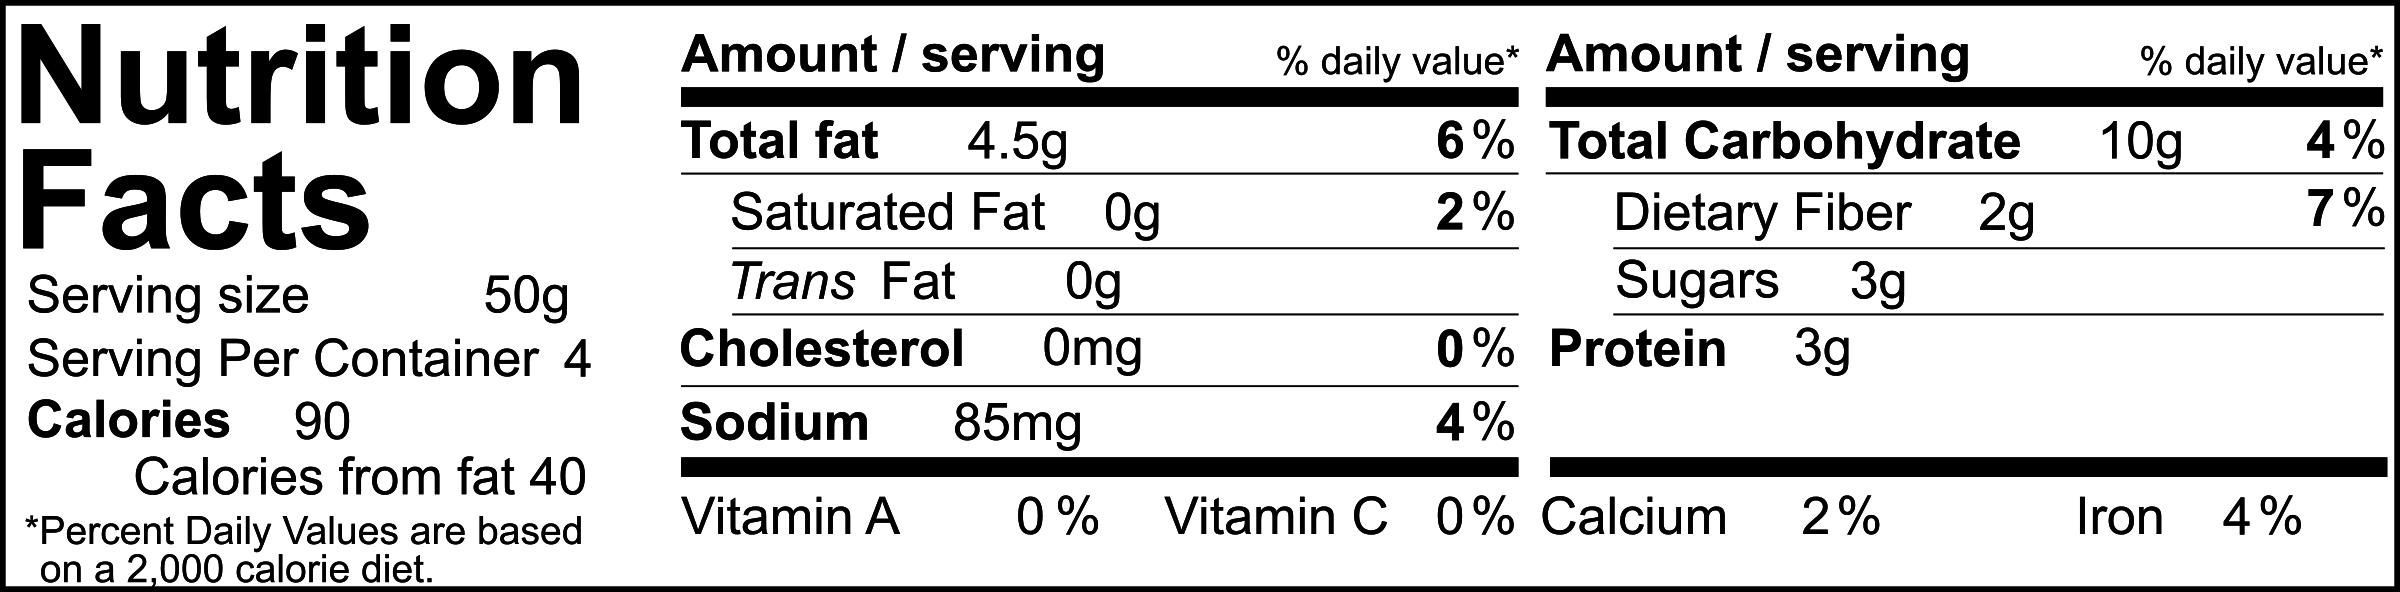 wgf-onion-pakora-nutrition-facts-29jan2018.png